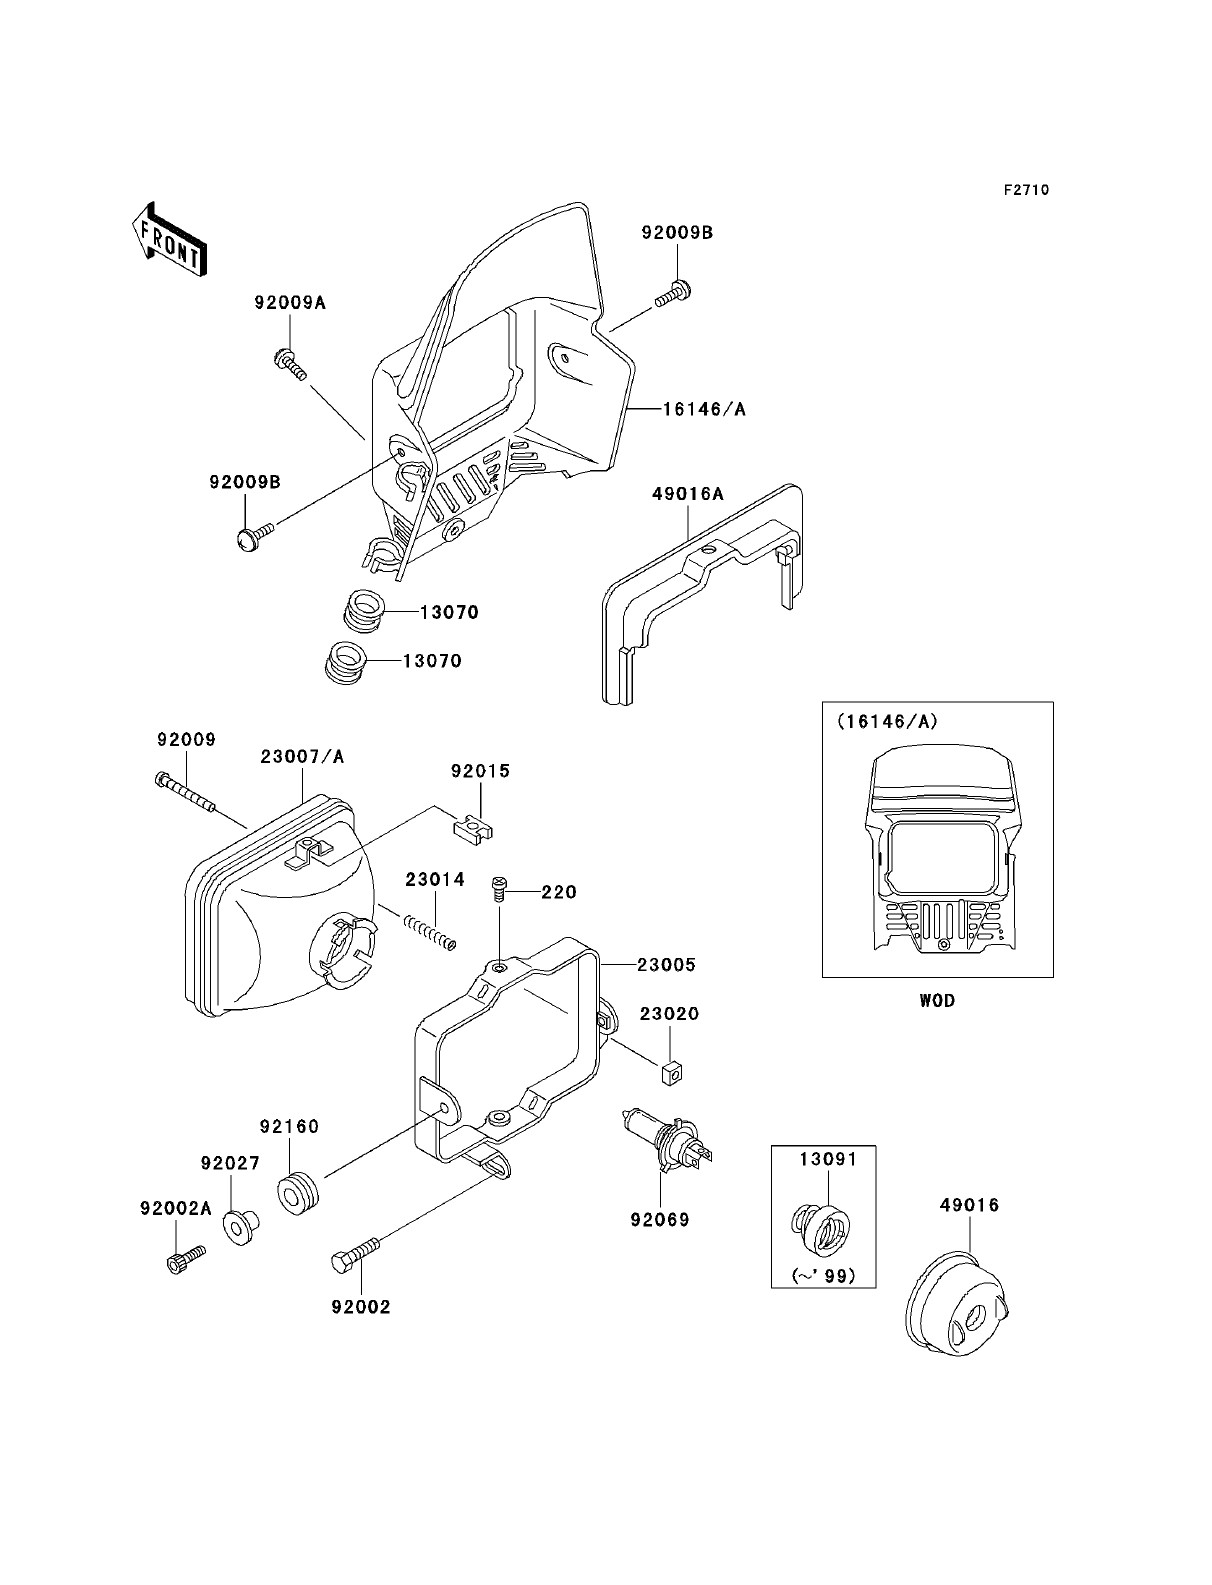 drum brake assembly diagram modifying a drum brake hub for